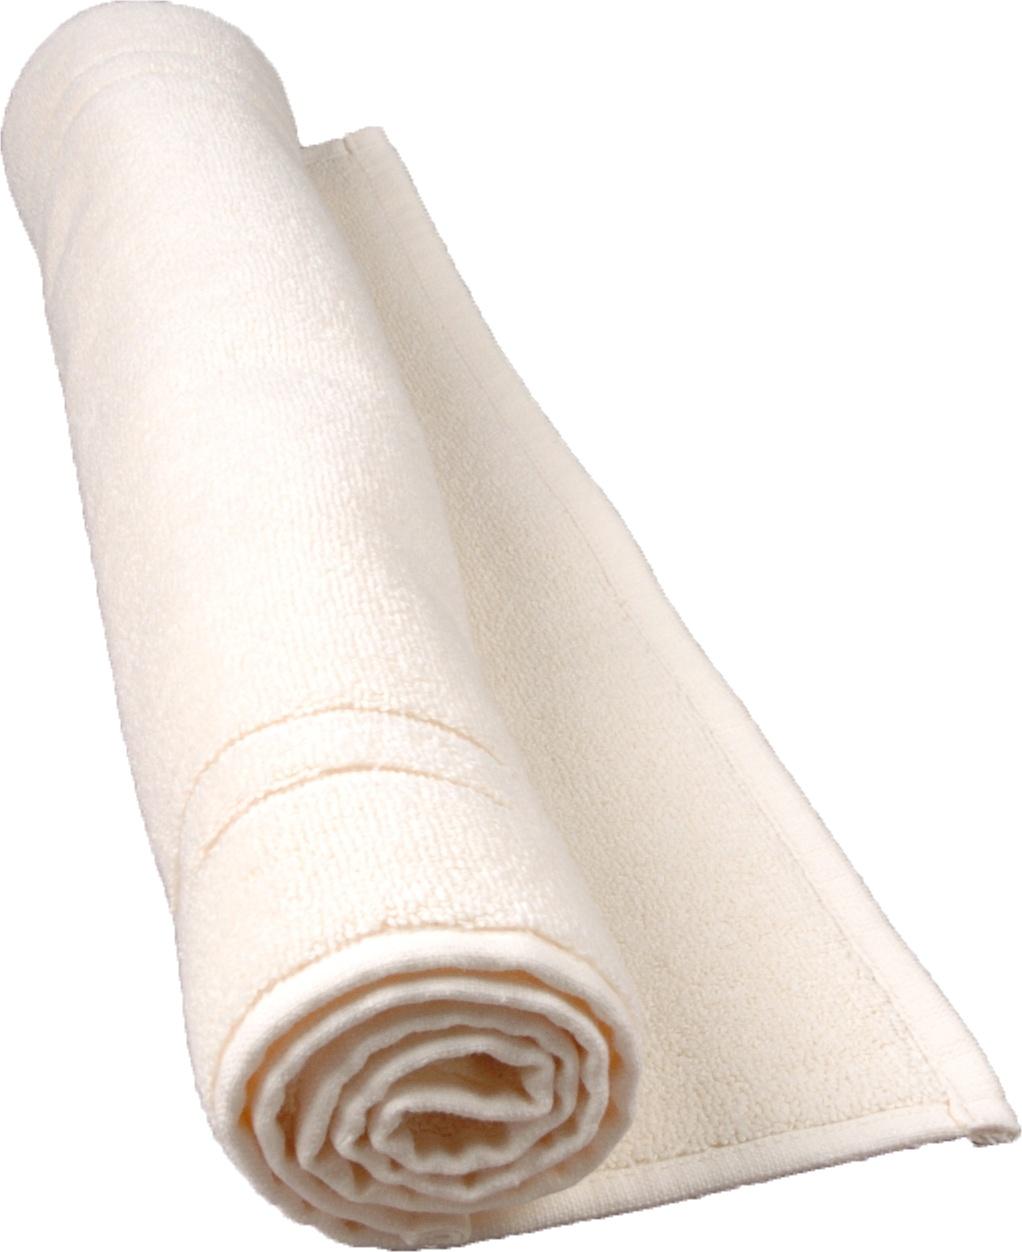 Tapis de bain 50 x 80 cm en Coton couleur Ecru (Ecru)